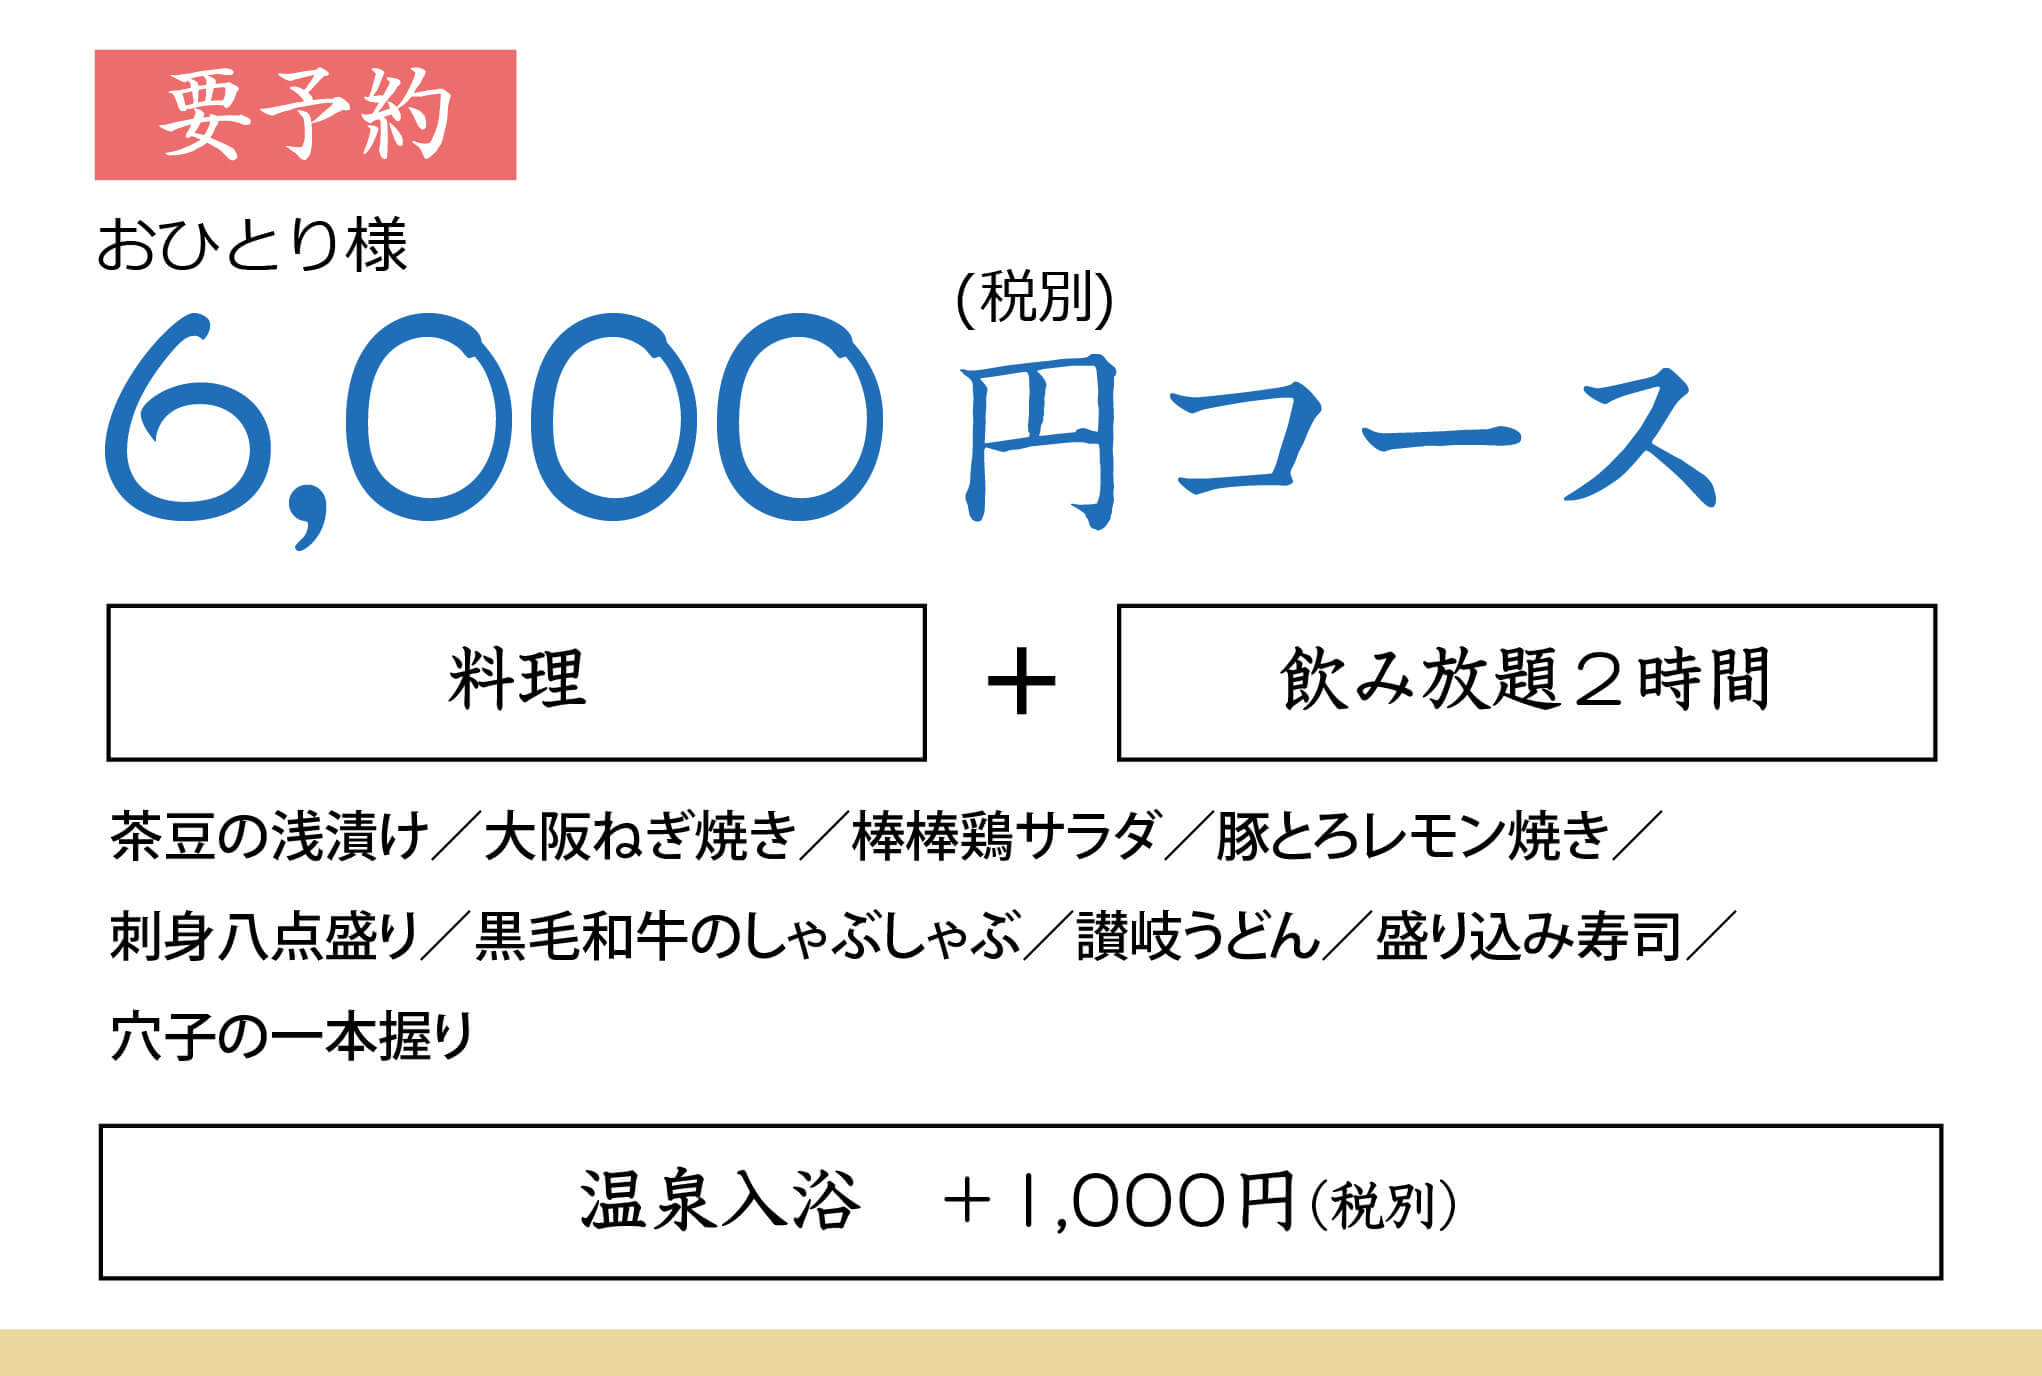 6,000円